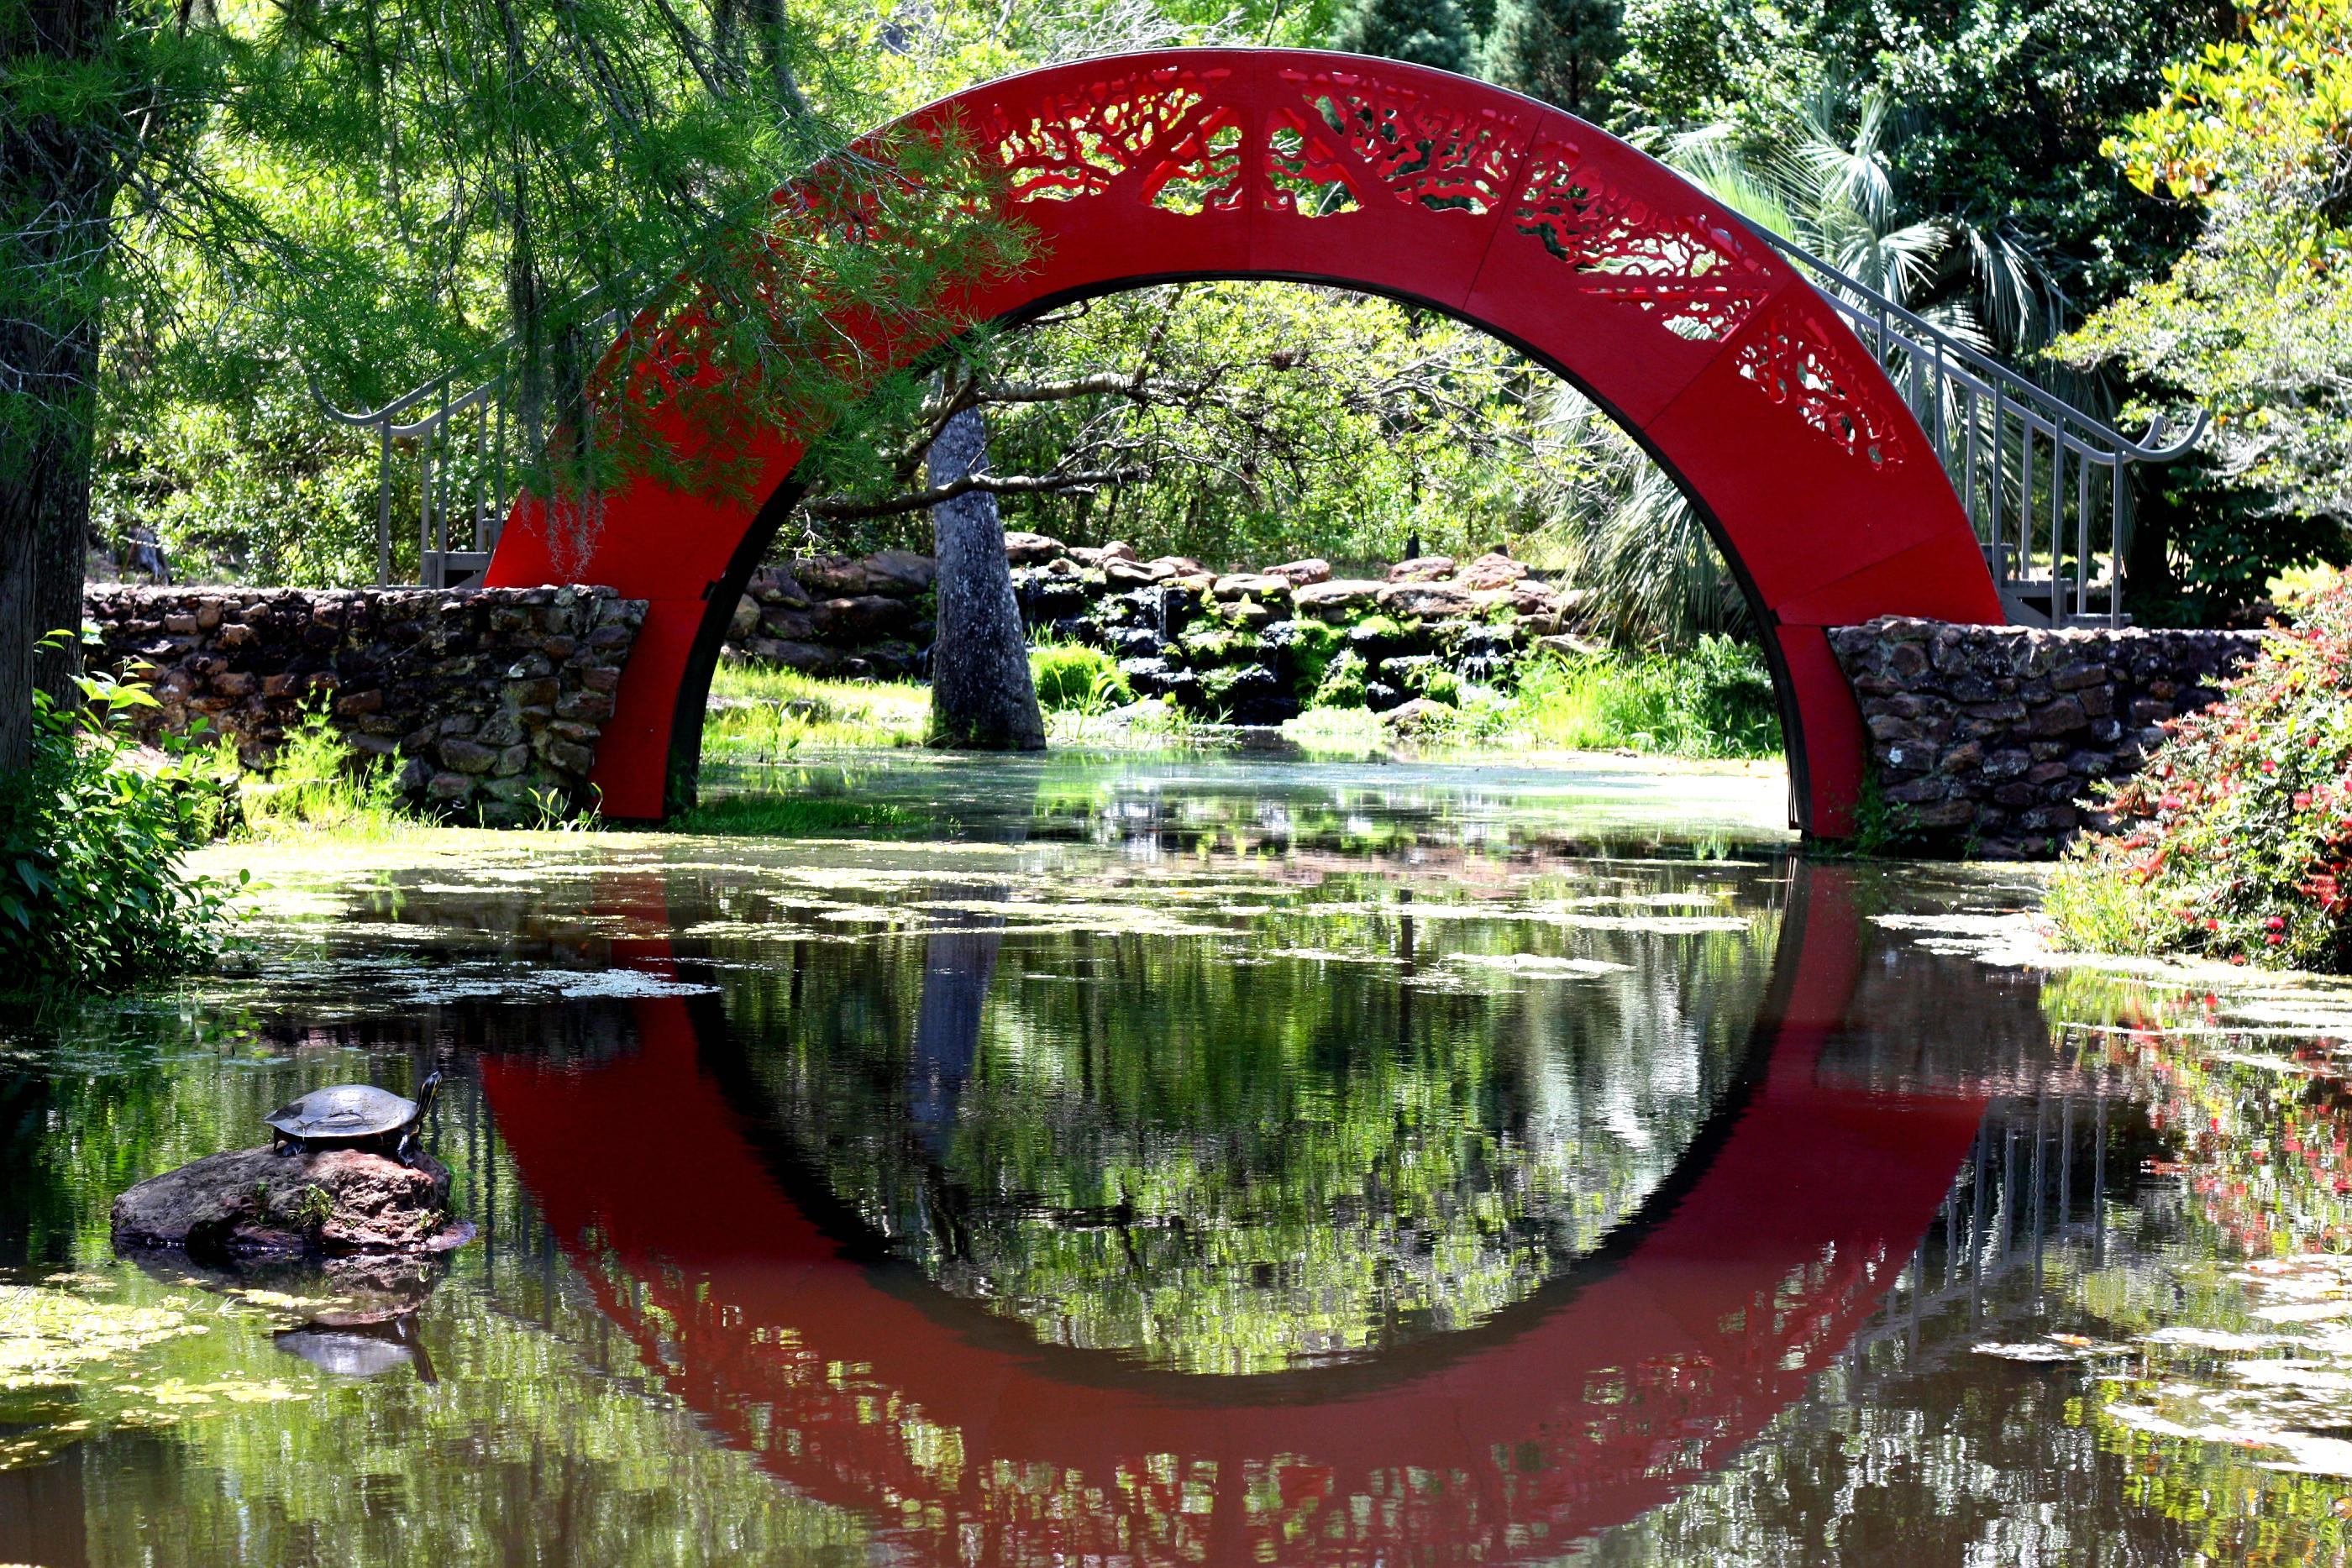 bellingrath garden oriental dragon christmas lights | Bellingrath gardens clipart - Clipground